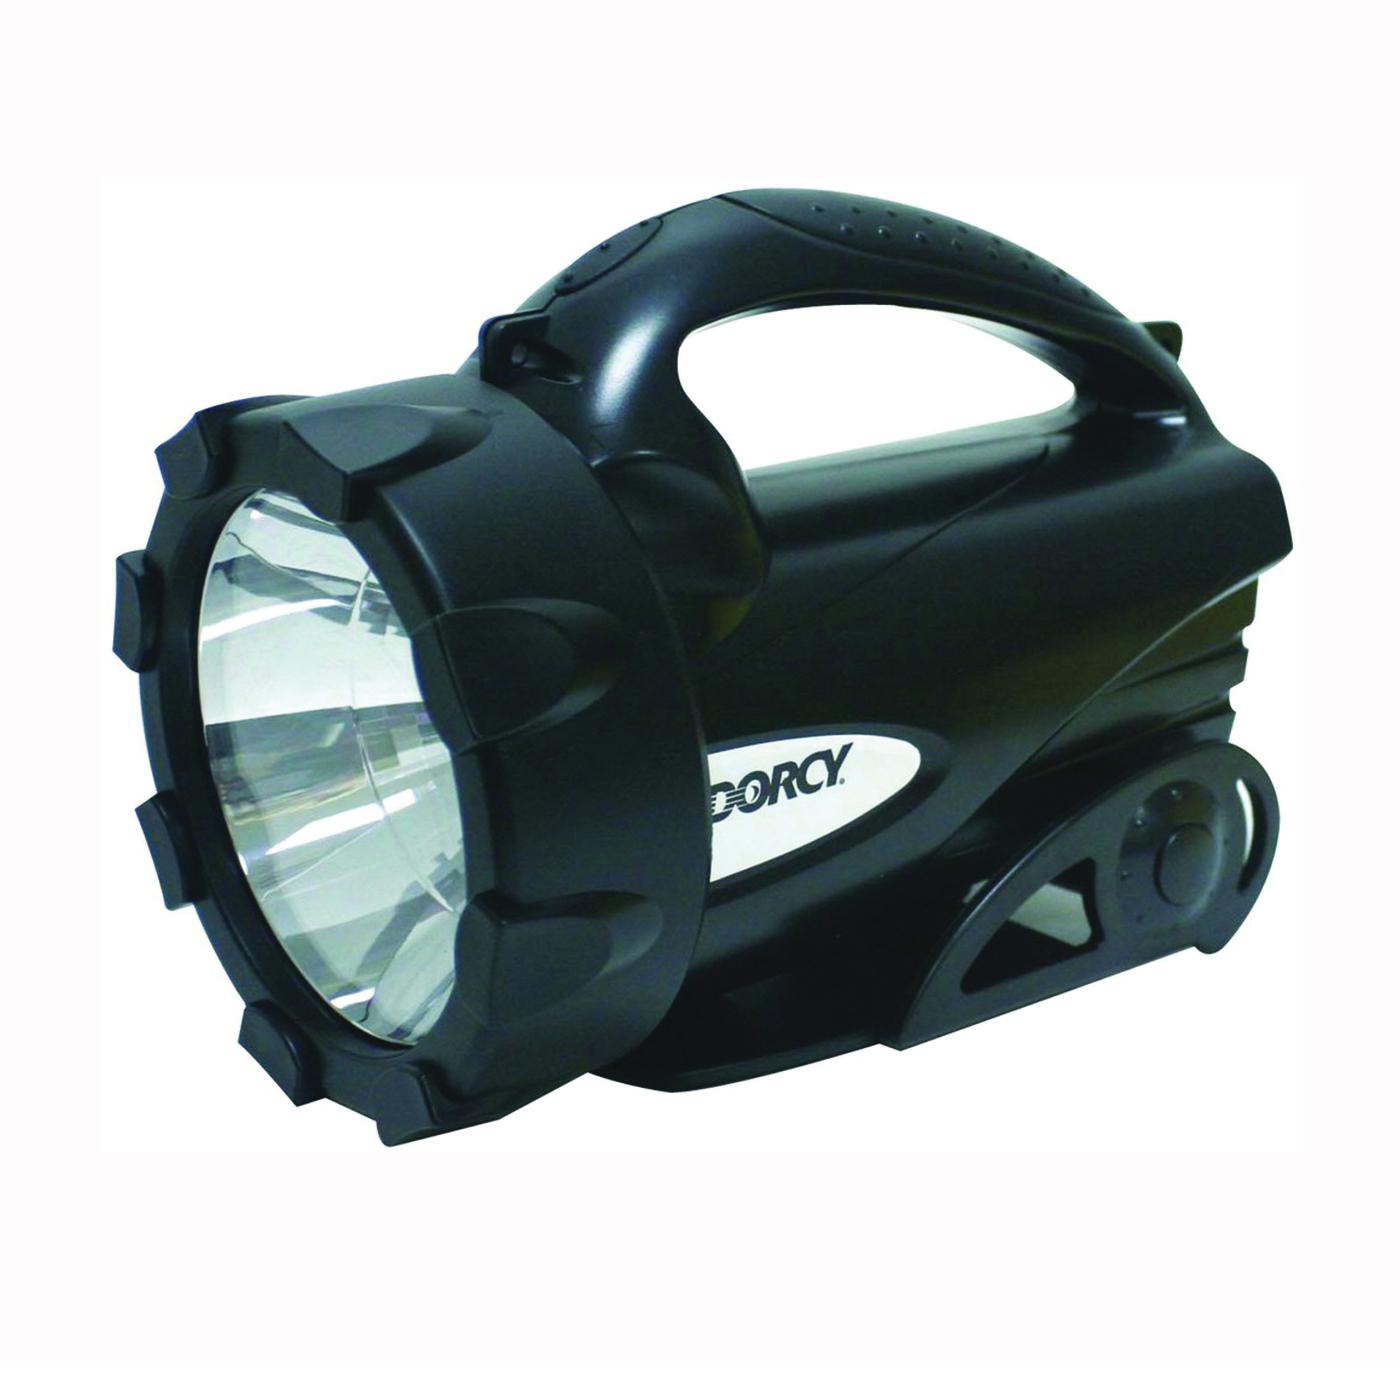 Picture of Dorcy 41-4291 LED Lantern, D Battery, LED Lamp, 500 Lumens Lumens, Black